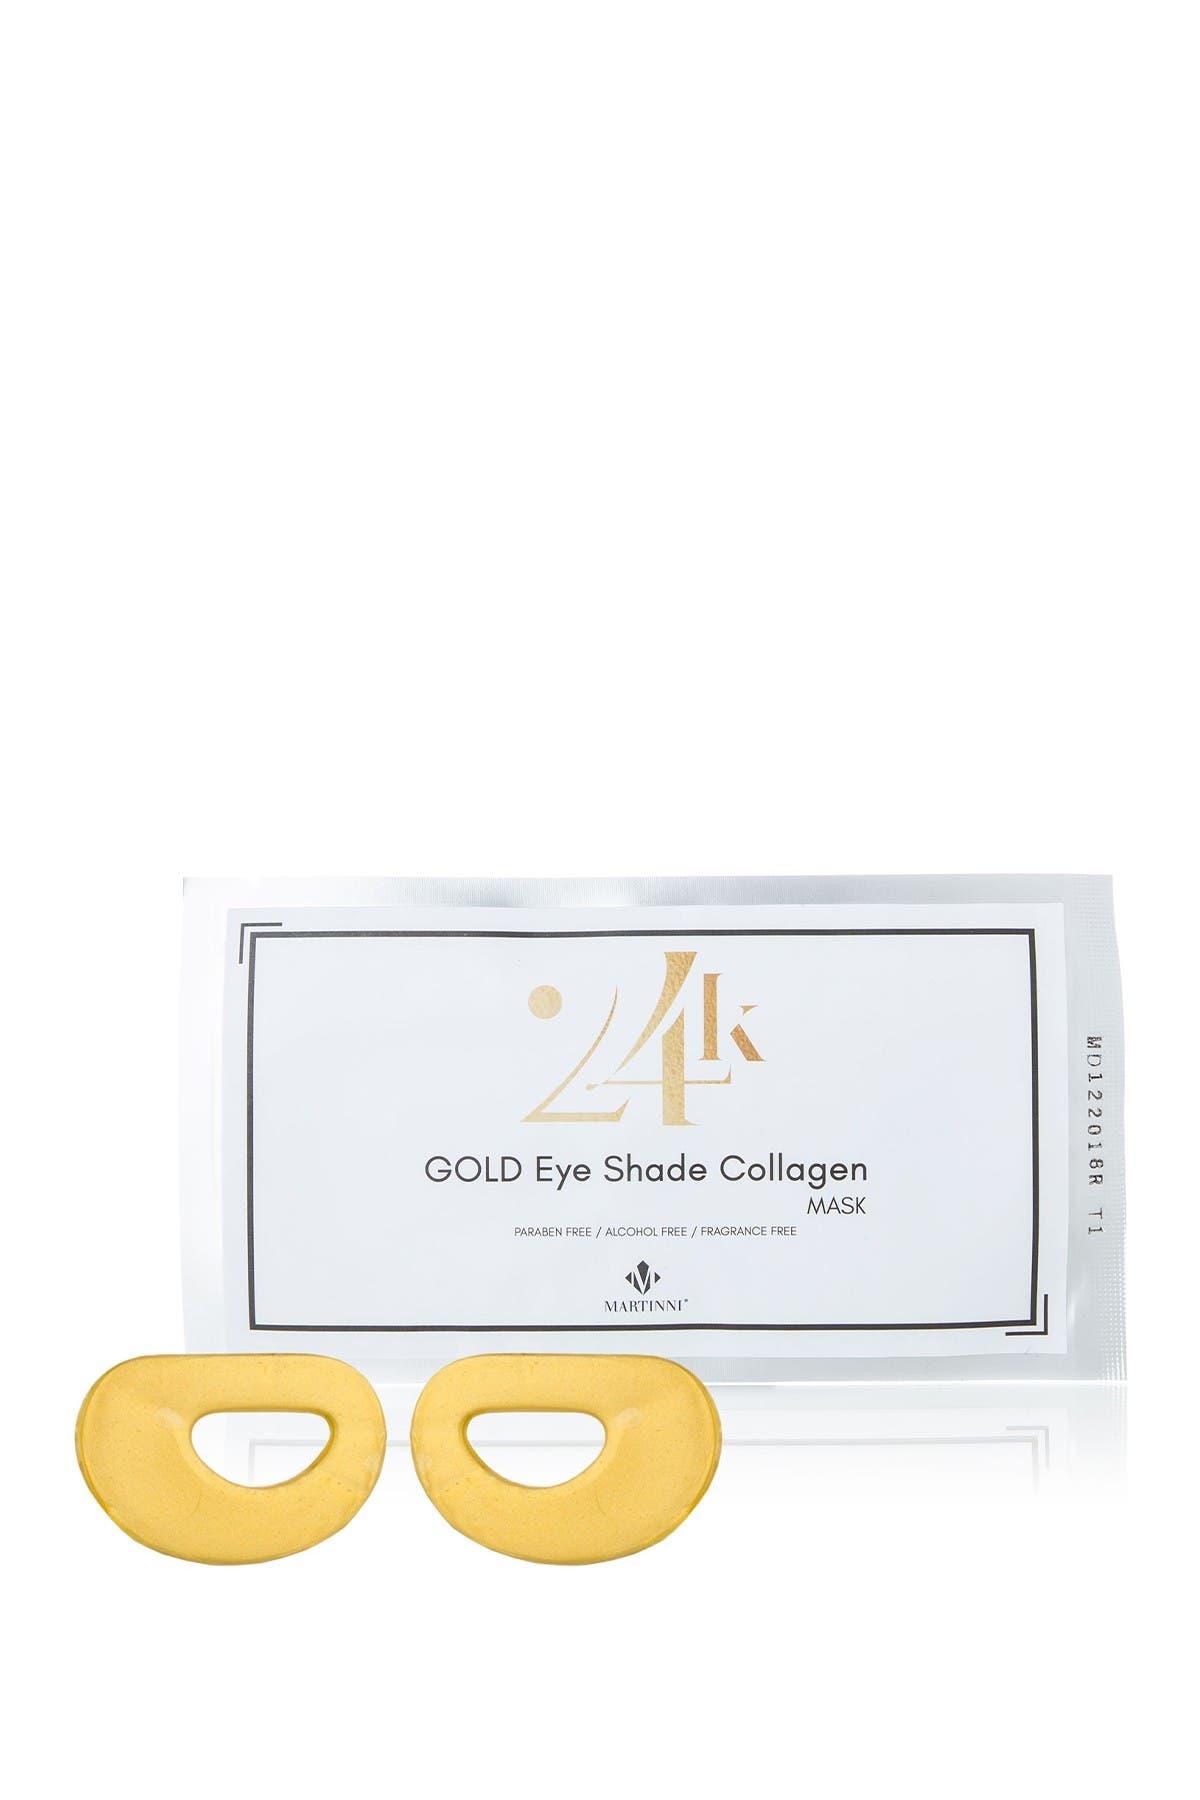 Image of MARTINNI MASKS 24K Gold Anti-Aging Collagen Eye Mask Treatments - Set of 3